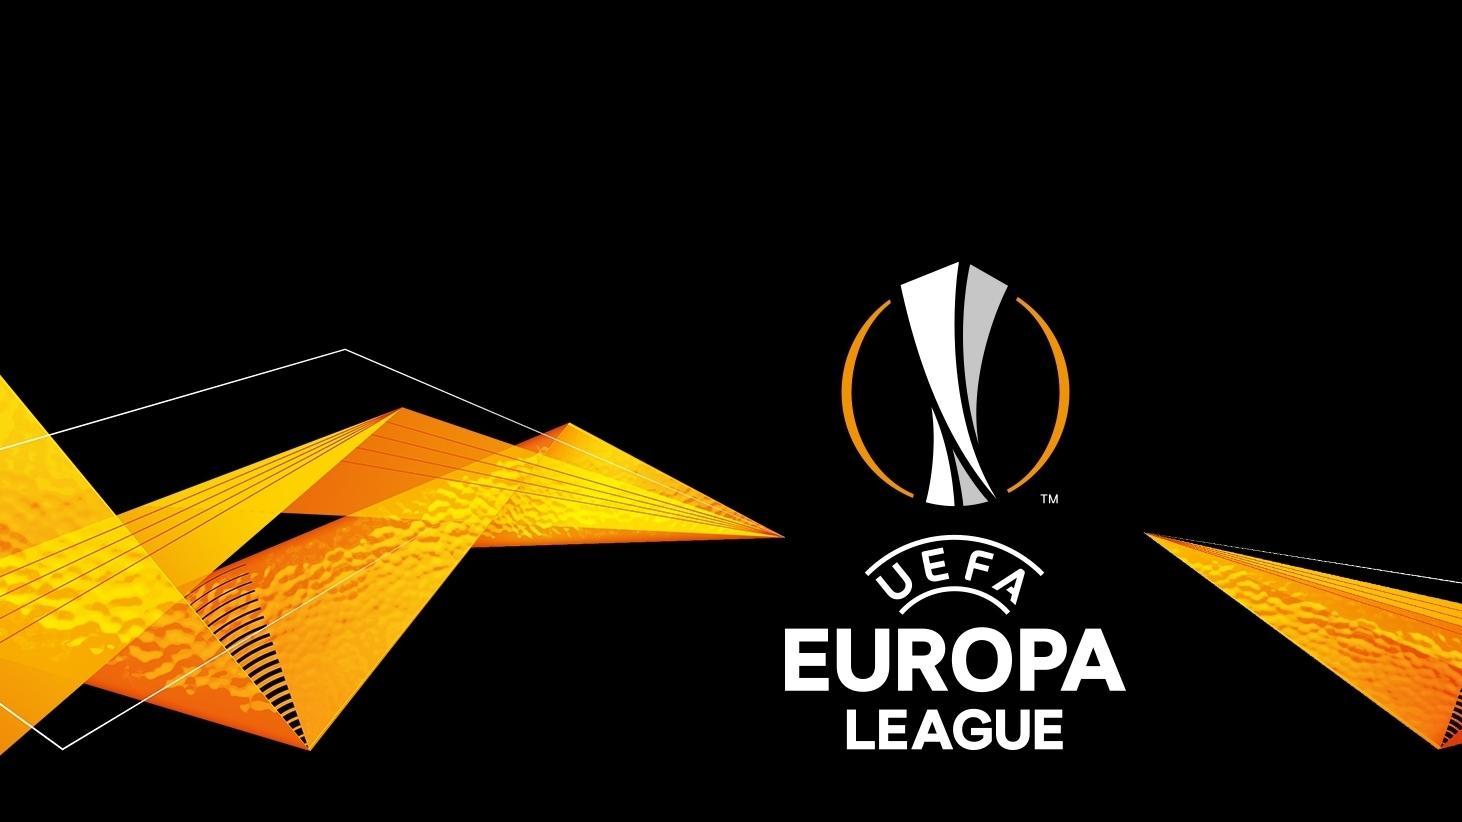 Mozzart Bet offering world's highest odds in three Europa League games